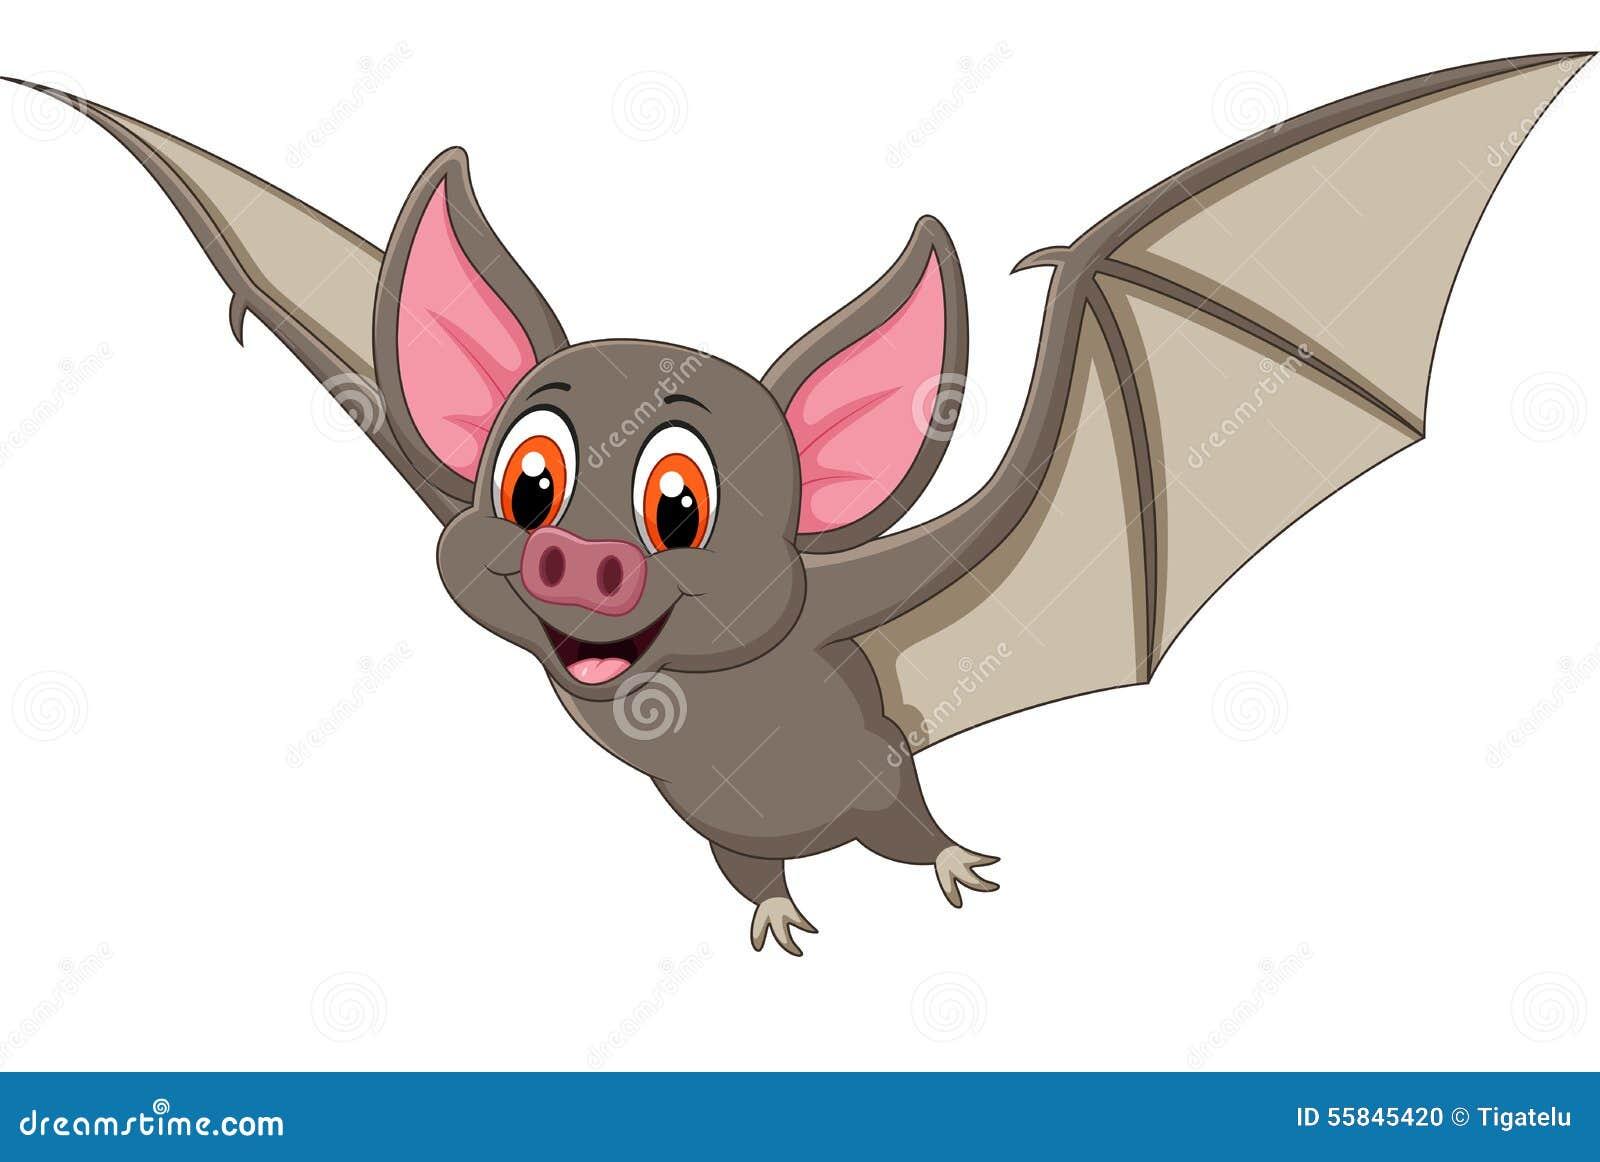 Bat Cartoon Flying Stock Vector - Image: 55845420